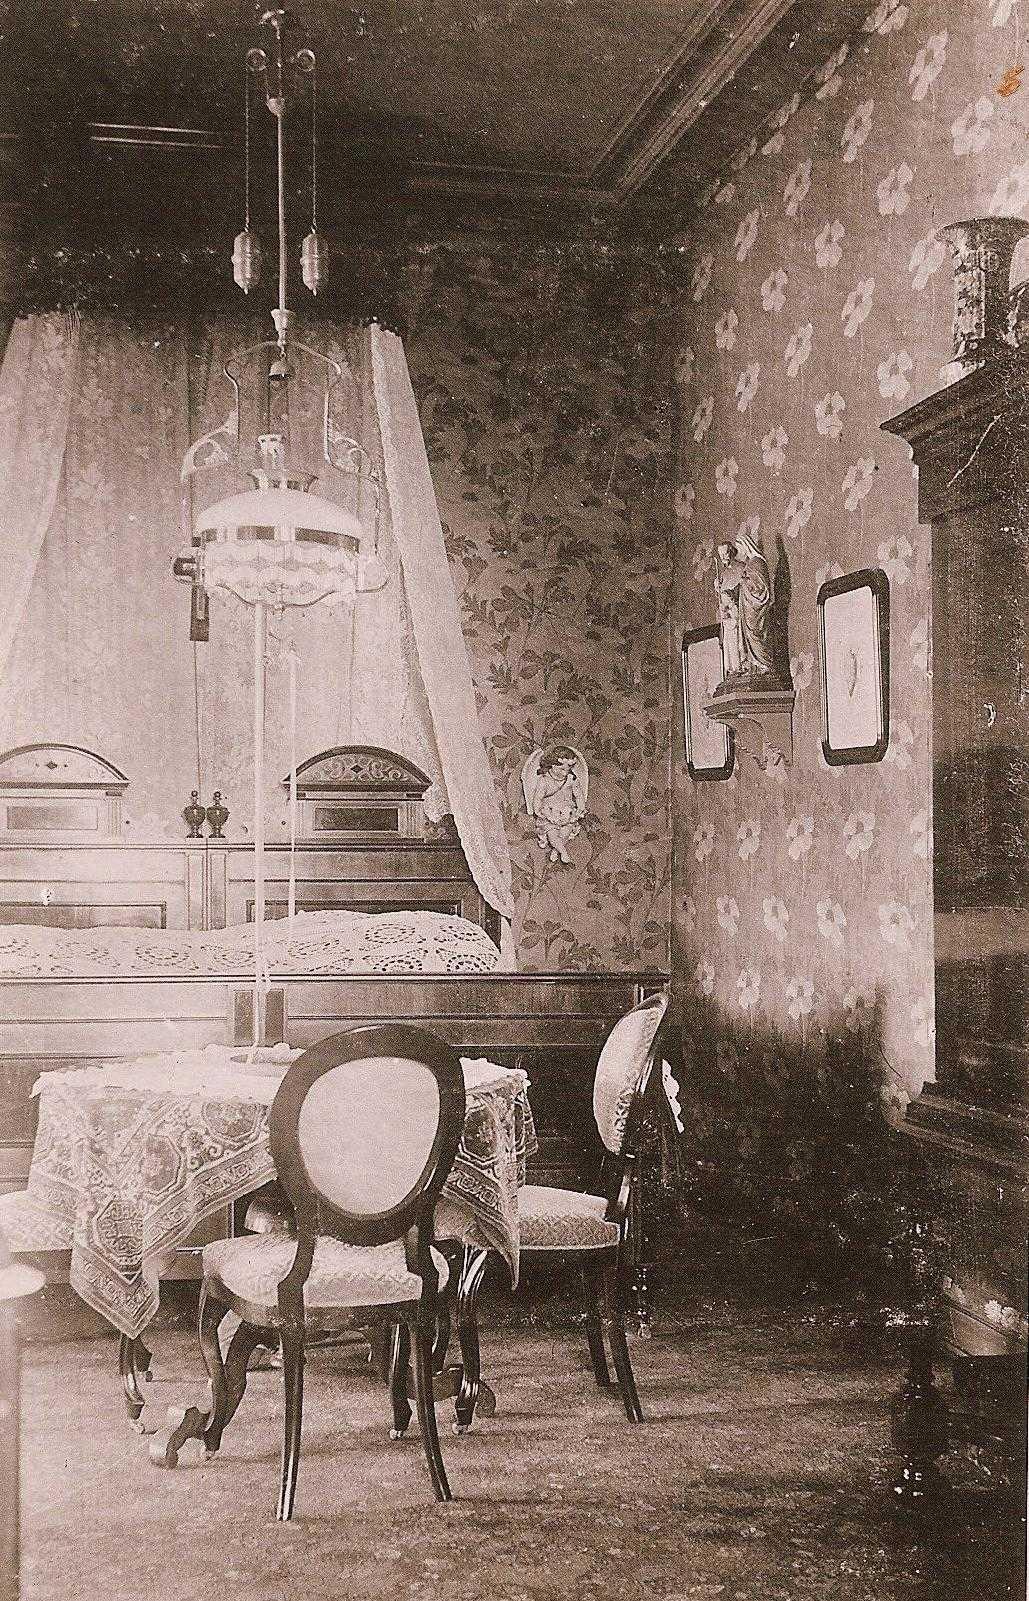 B&B-Tilburg Villa Tivoli interieur